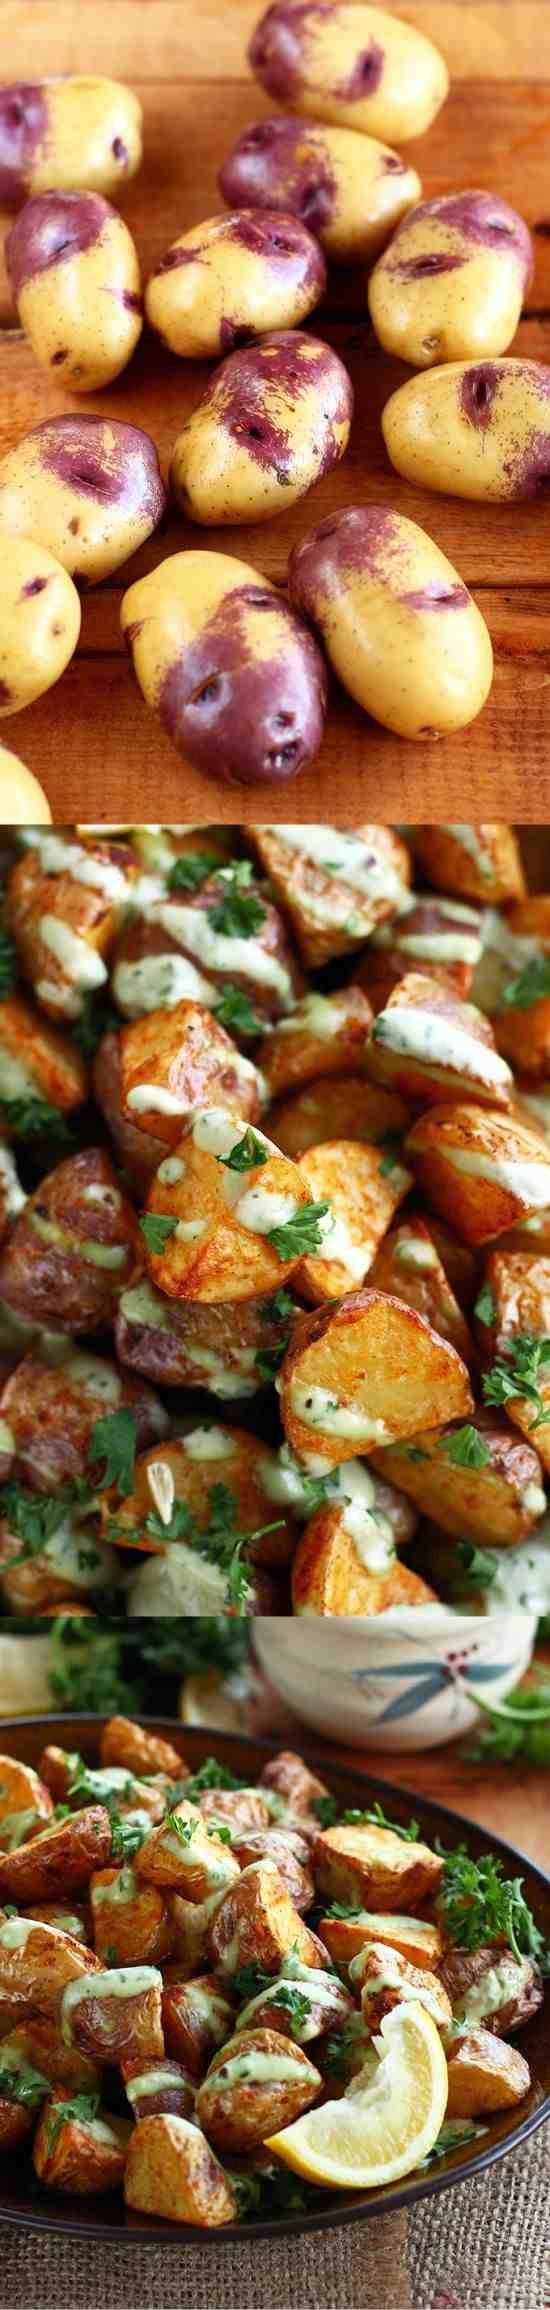 CRISPY POTATOES WITH GARLIC LEMON AVOCADO AIOLI - avocado, garlic, healthy, lemon, paprika, potato, recipes